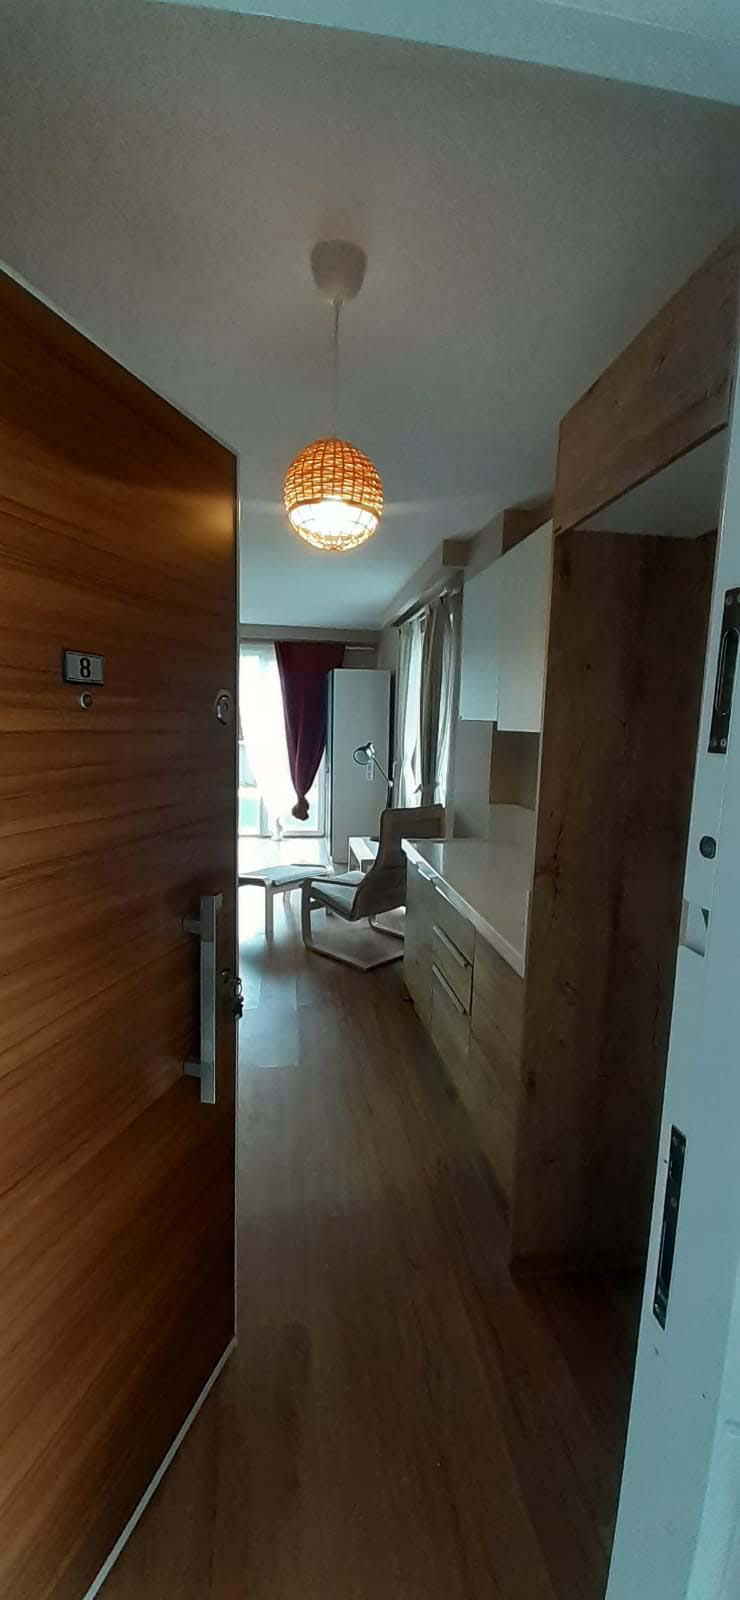 istanbul-house2-safiran